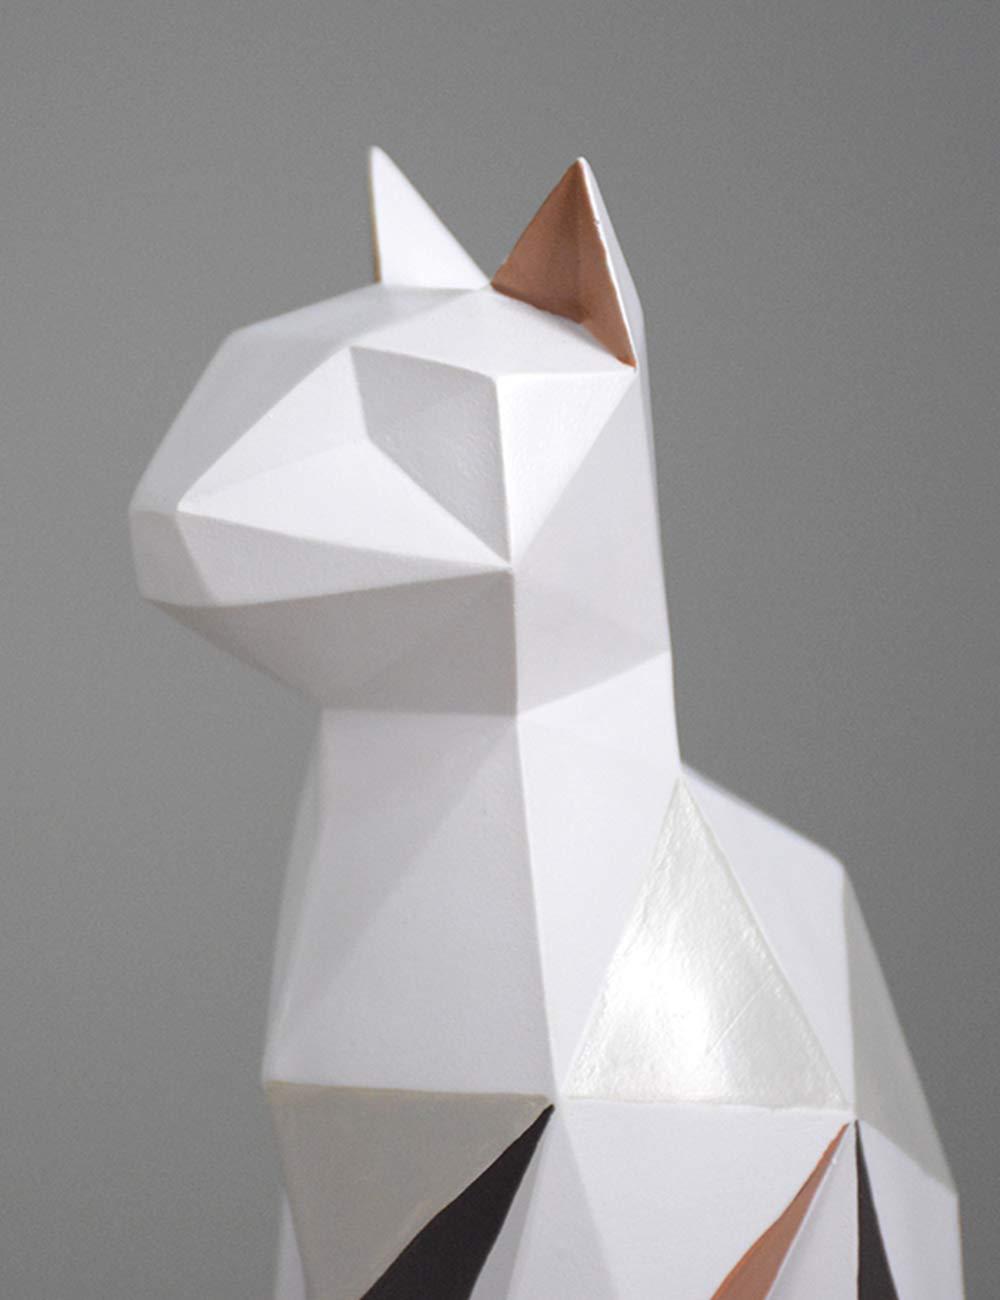 HomeBerry Cat Sculpture Figurine Statue Animal Home Decor Gift ...